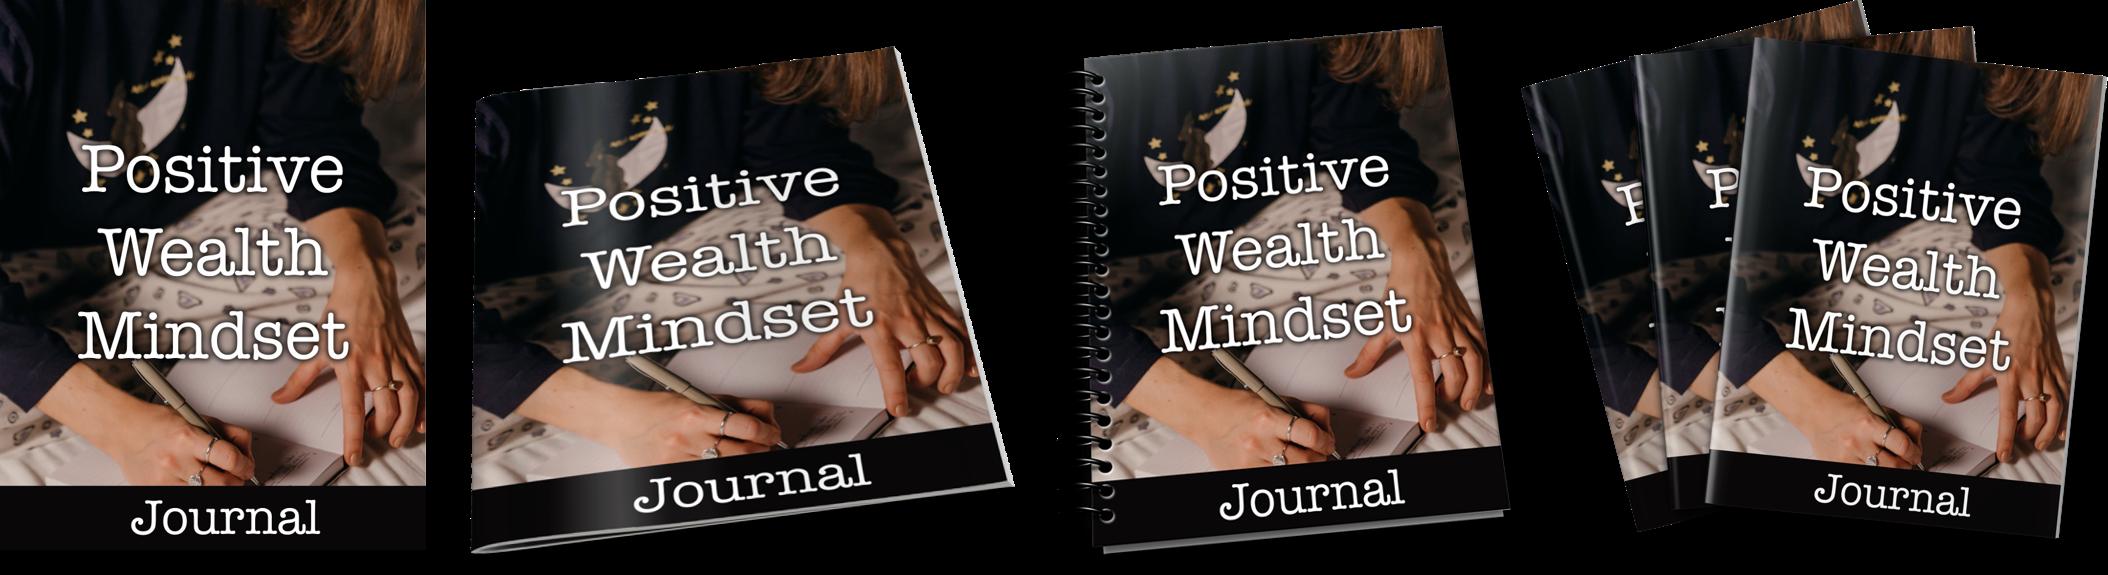 3 positive wealth mindset ecovers